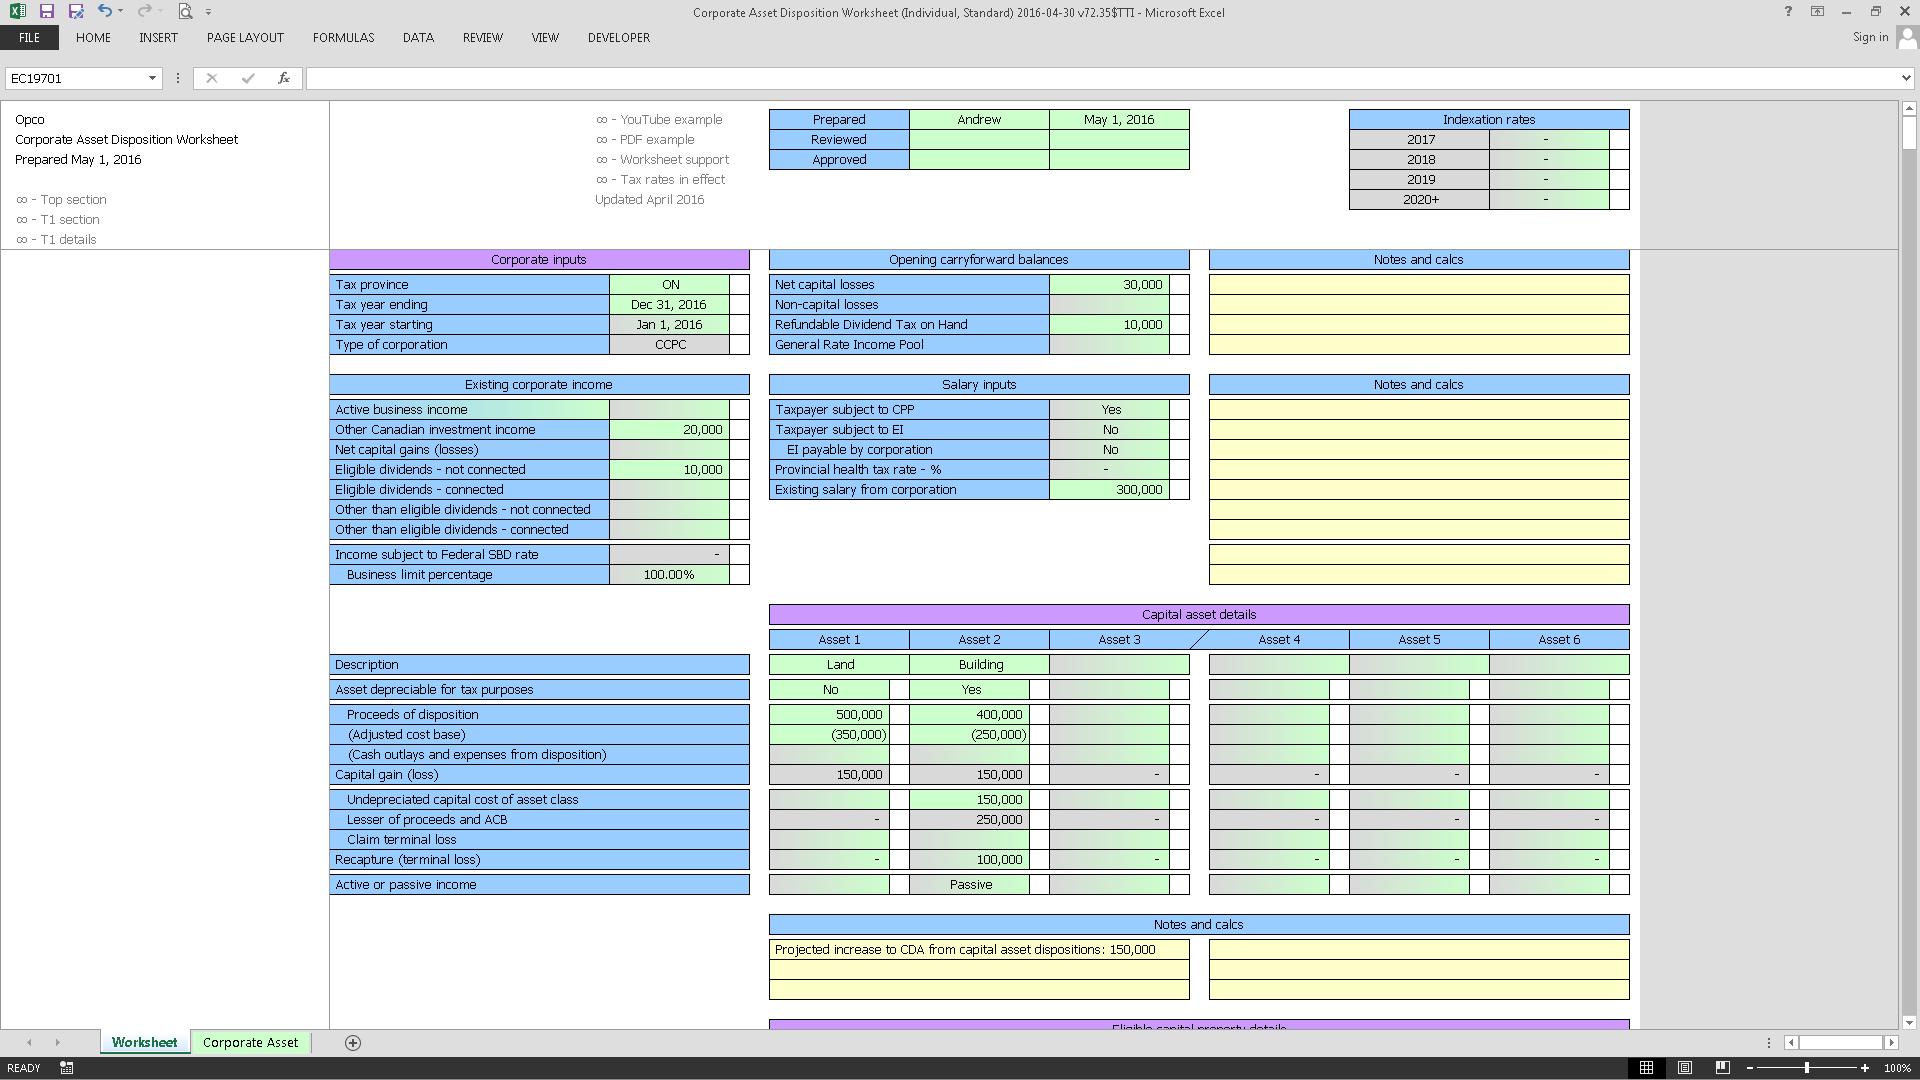 Corporate Asset Disposition Worksheet (Individual, Standard) 2016-04-30 v72.35$TTI_Cover.png